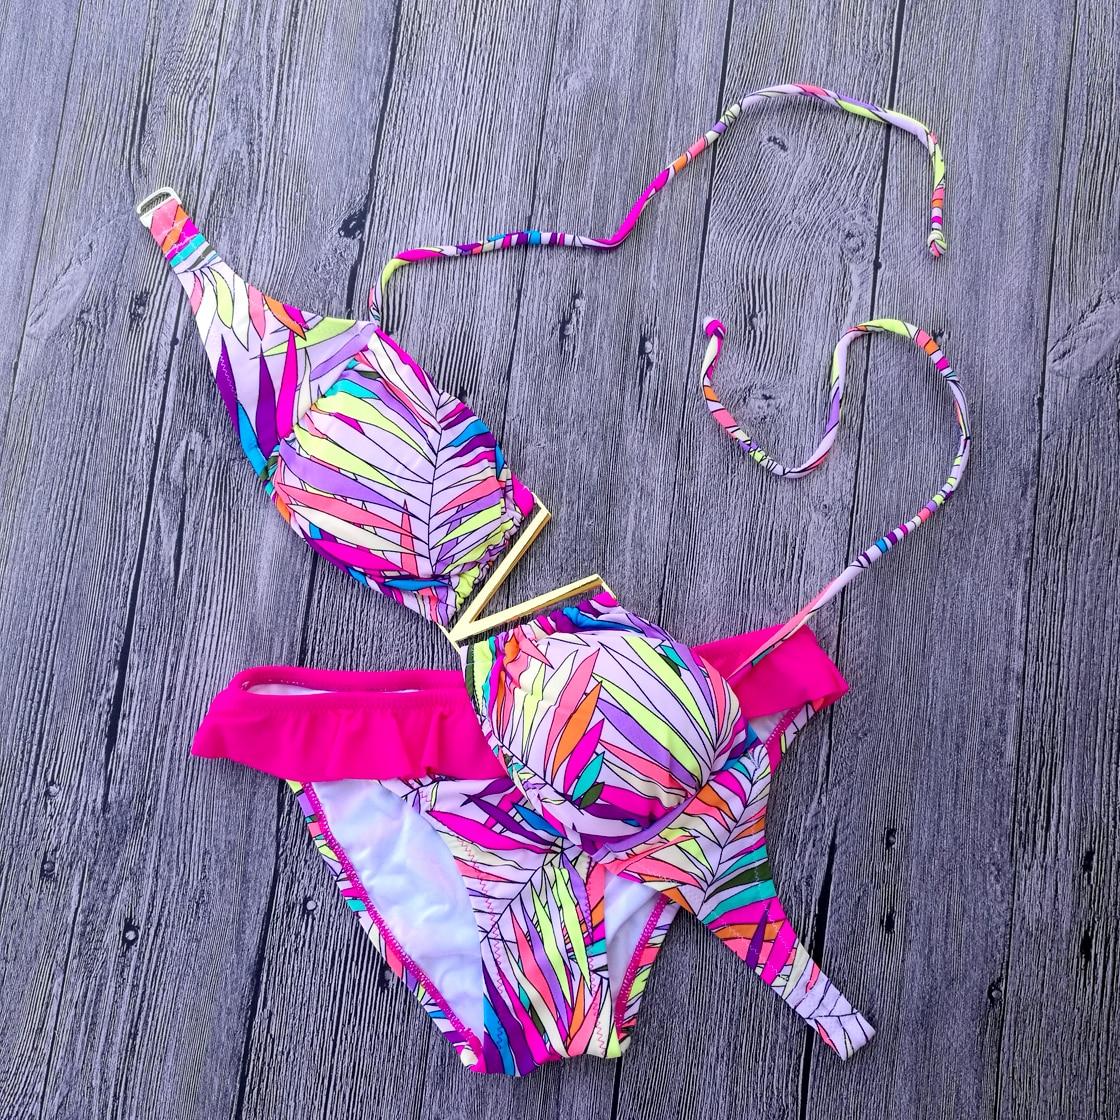 Pink Flower Print Bikini Set Red Swimwear Women Swimsuit 2017 Biquini Bathing Suit Designs Secret maillot de bain<br><br>Aliexpress